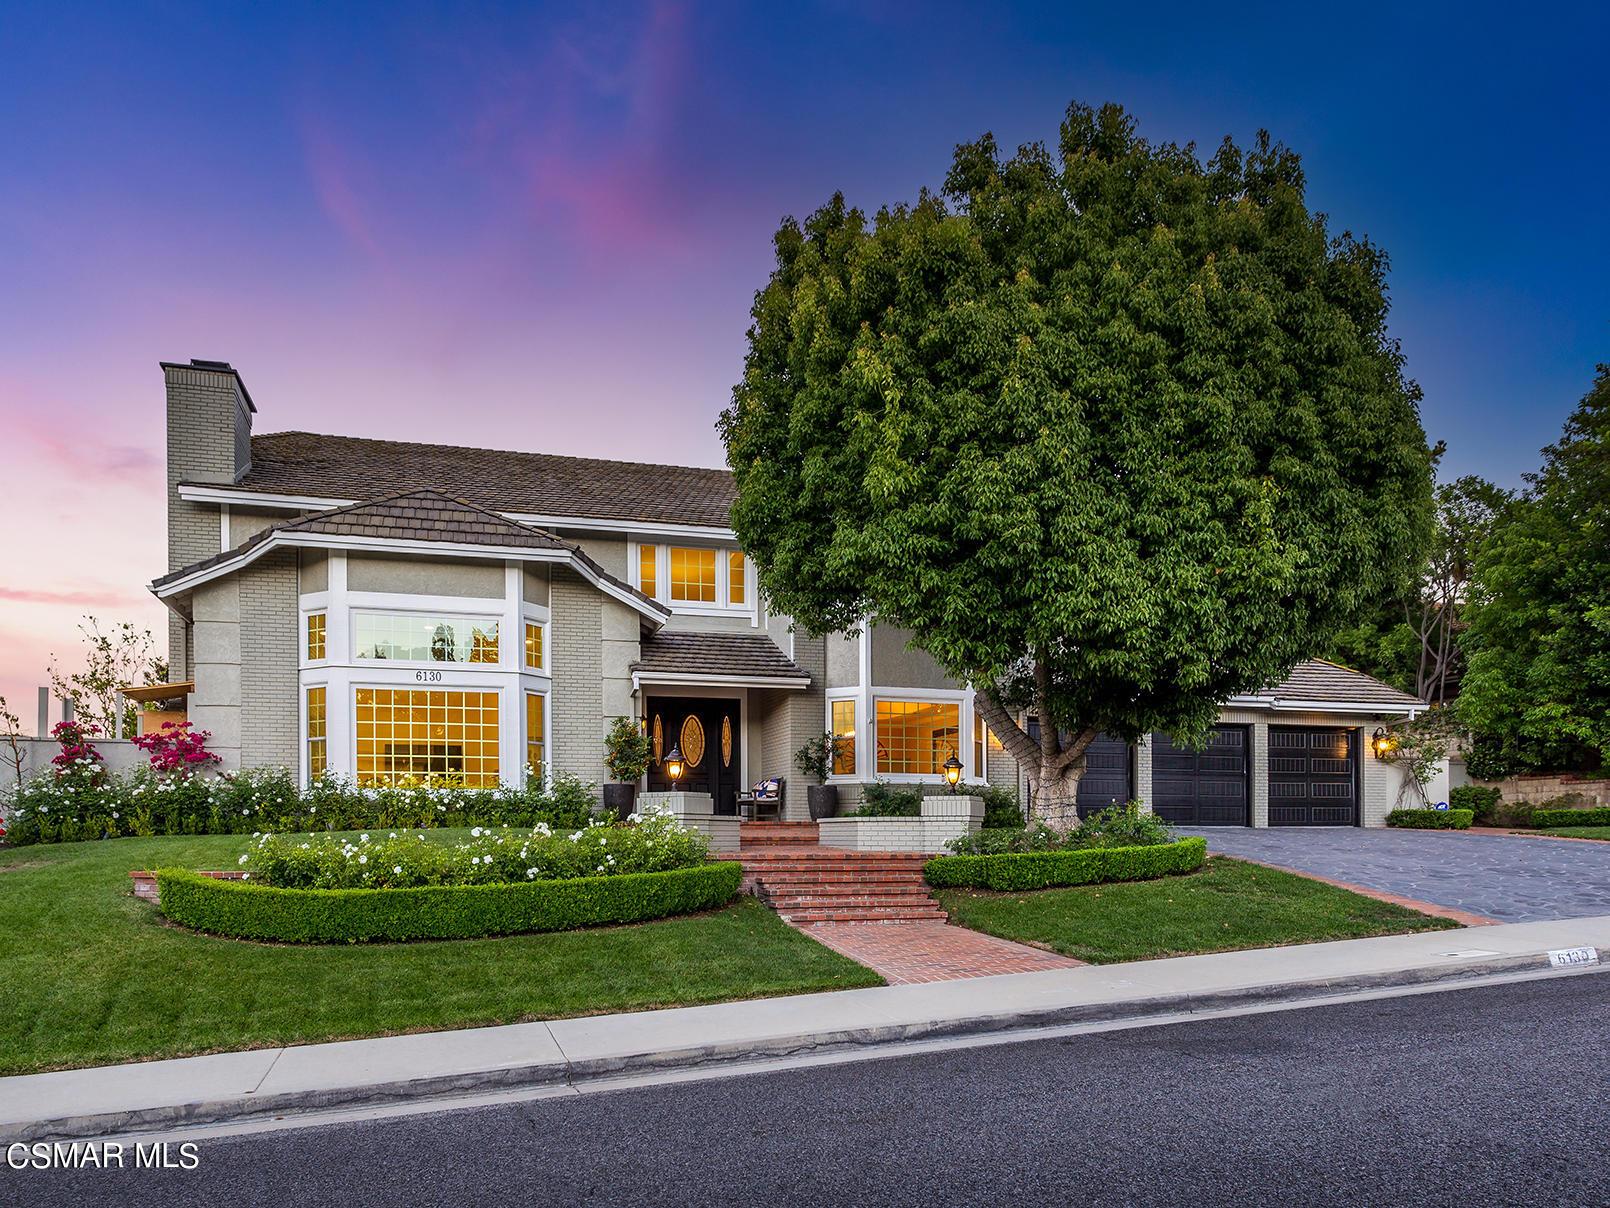 Photo of 6130 Heritage Drive, Agoura Hills, CA 91301